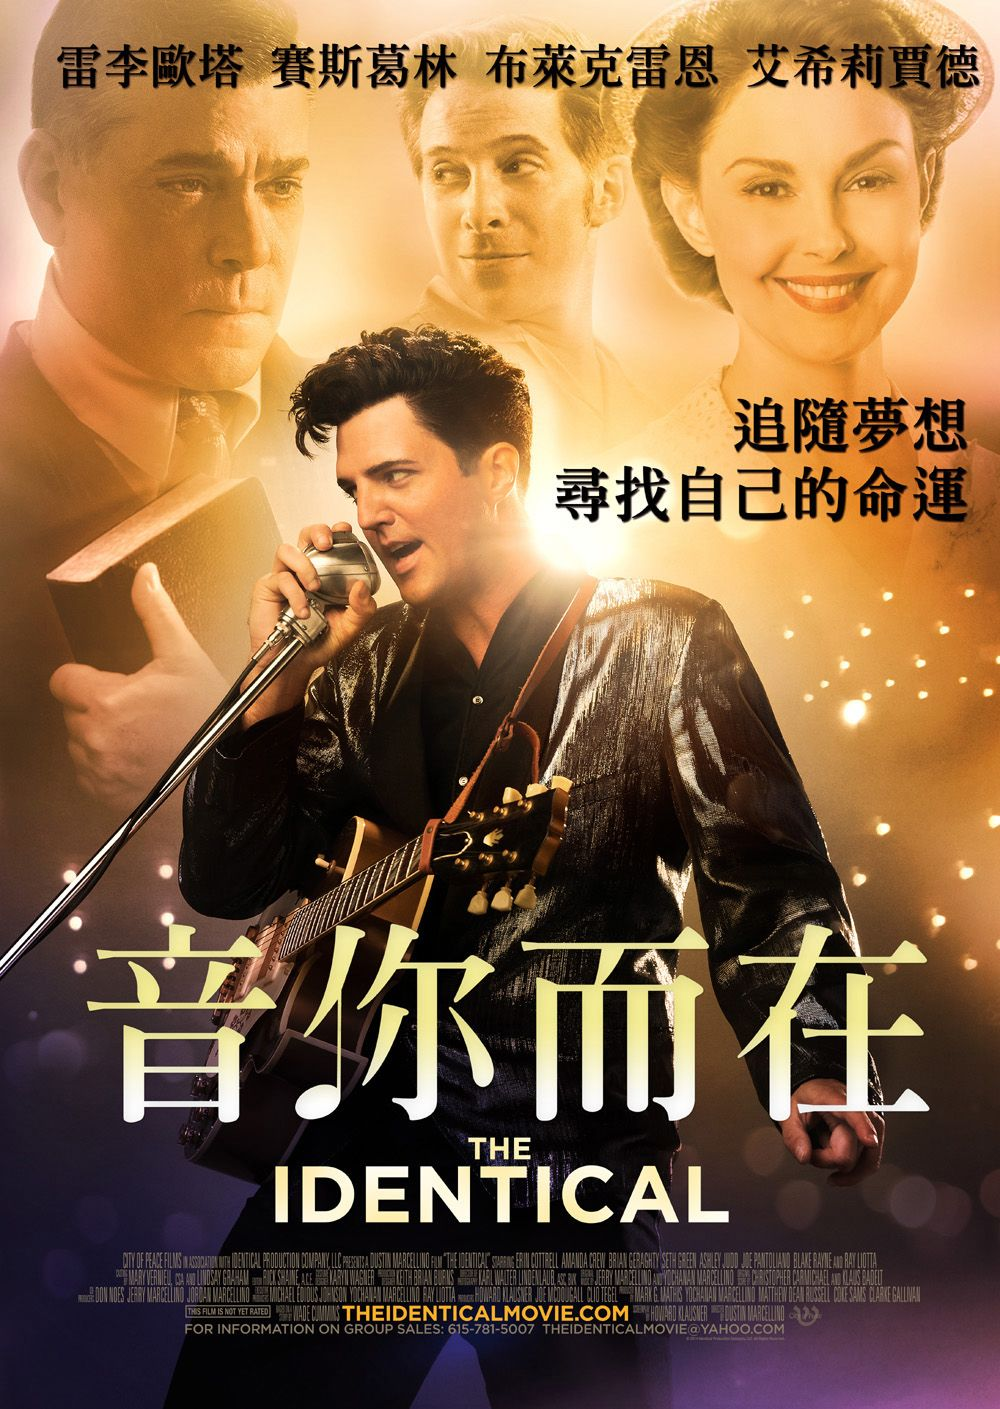 Pin by LINE TV on 戲劇橫/直圖 Christian movies, Film movie